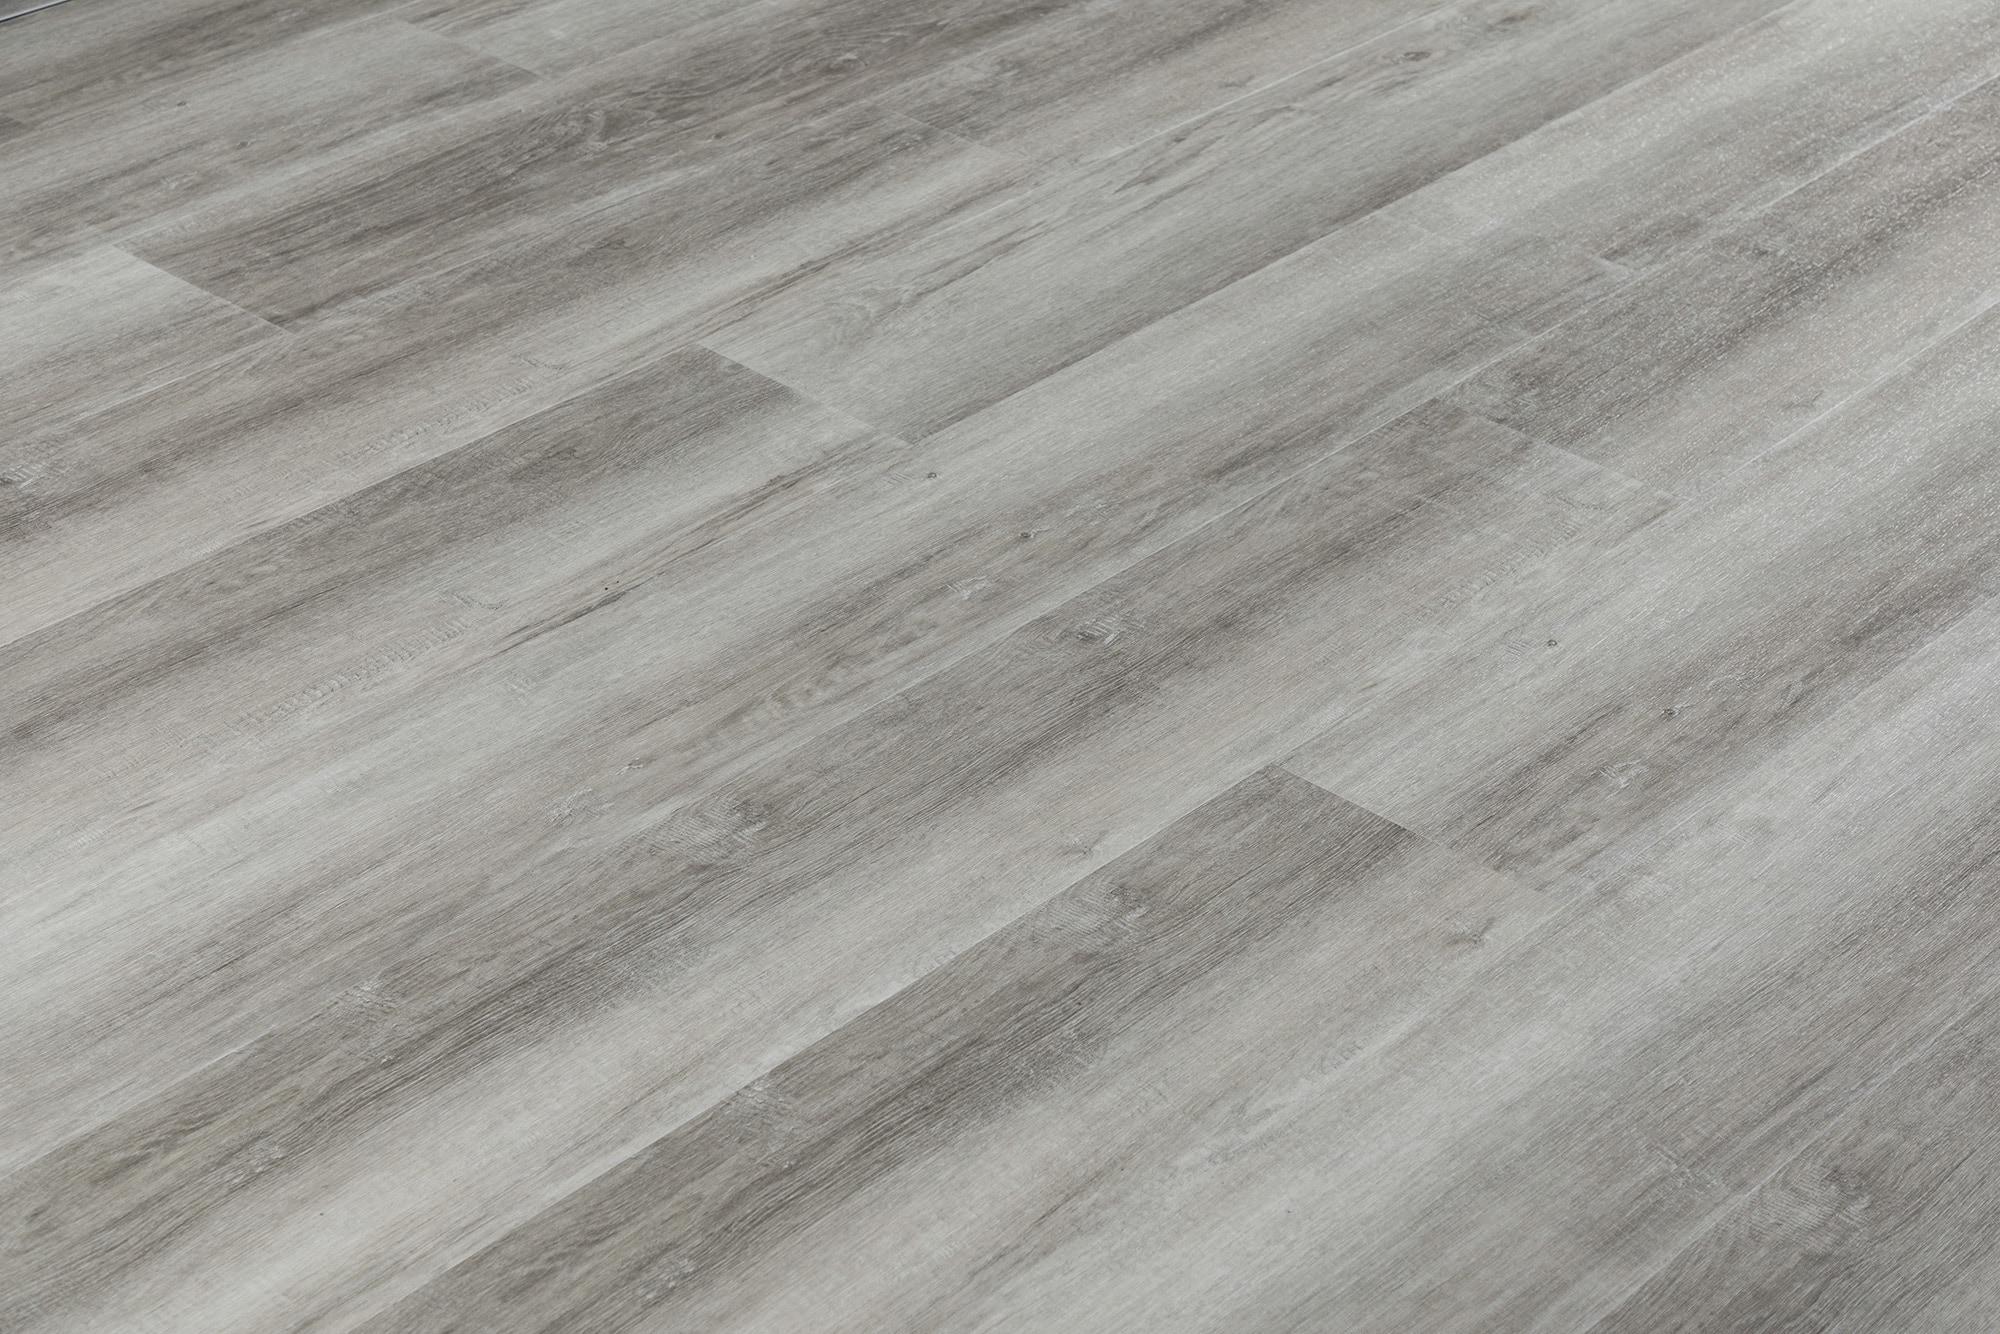 Grey Aged Texture French Oak / 6.5mm / SPC / Click Lock Vinyl Planks - 6.5mm SPC Click Lock - XL Jumbo Collection 0